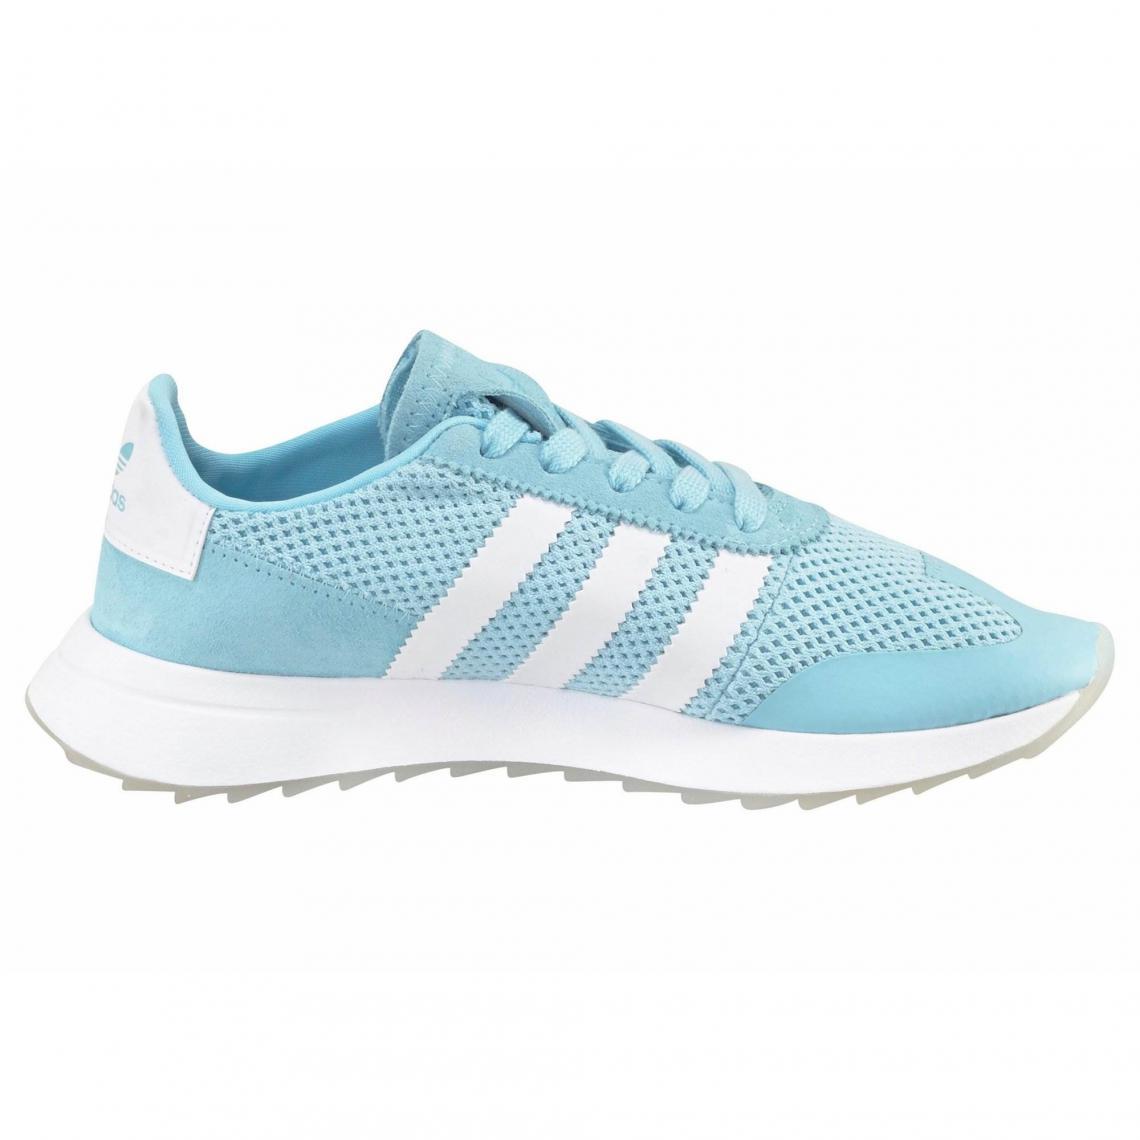 cf92ae122f498 Sneaker Originals Flashback W femme adidas - Bleu Pastel | 3 SUISSES